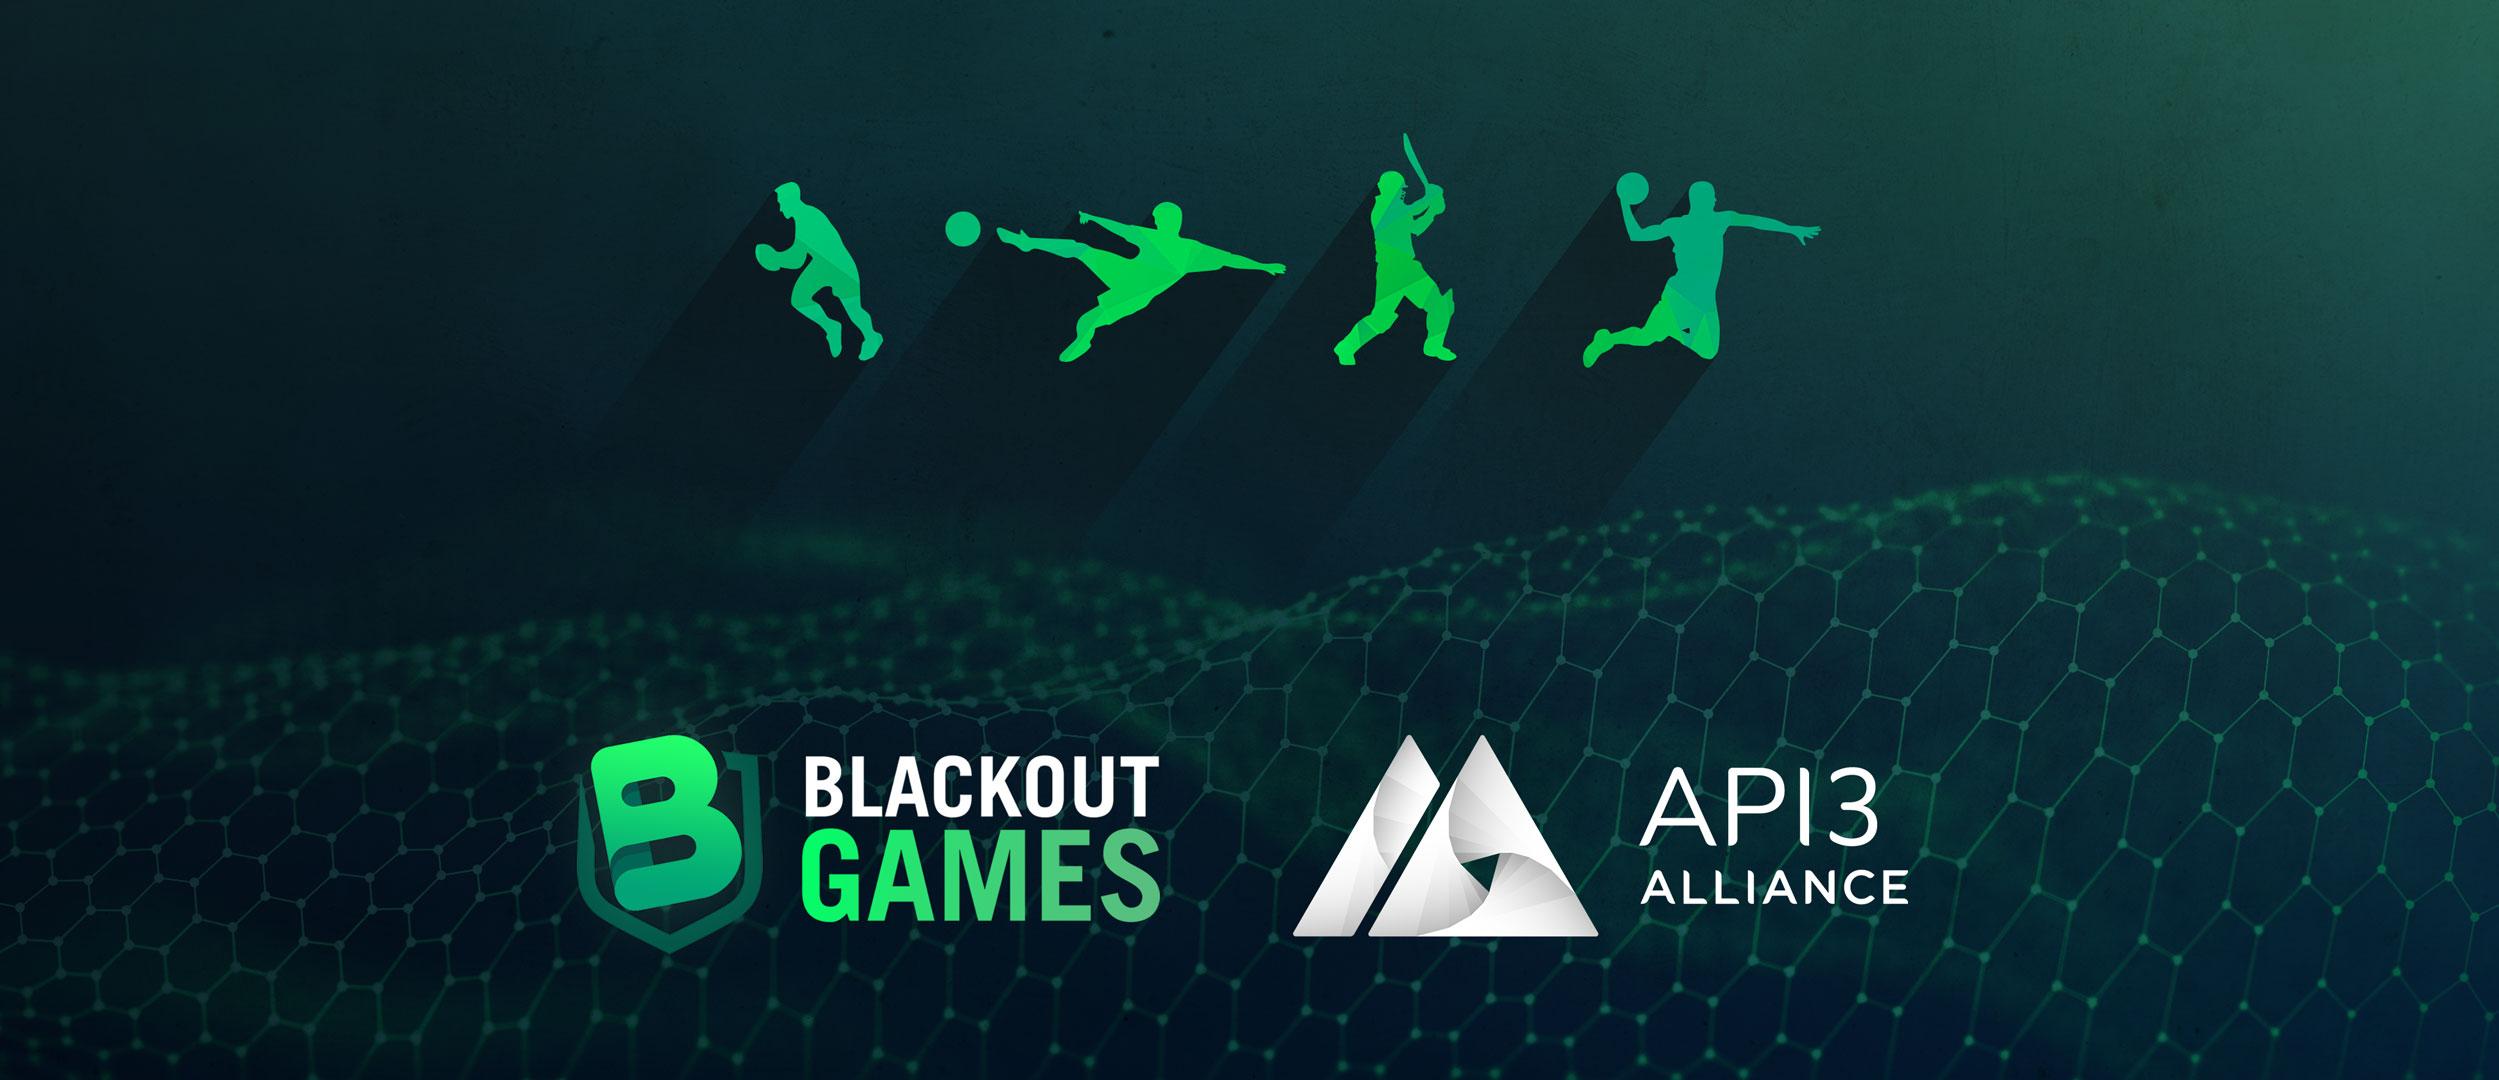 API3-Alliance